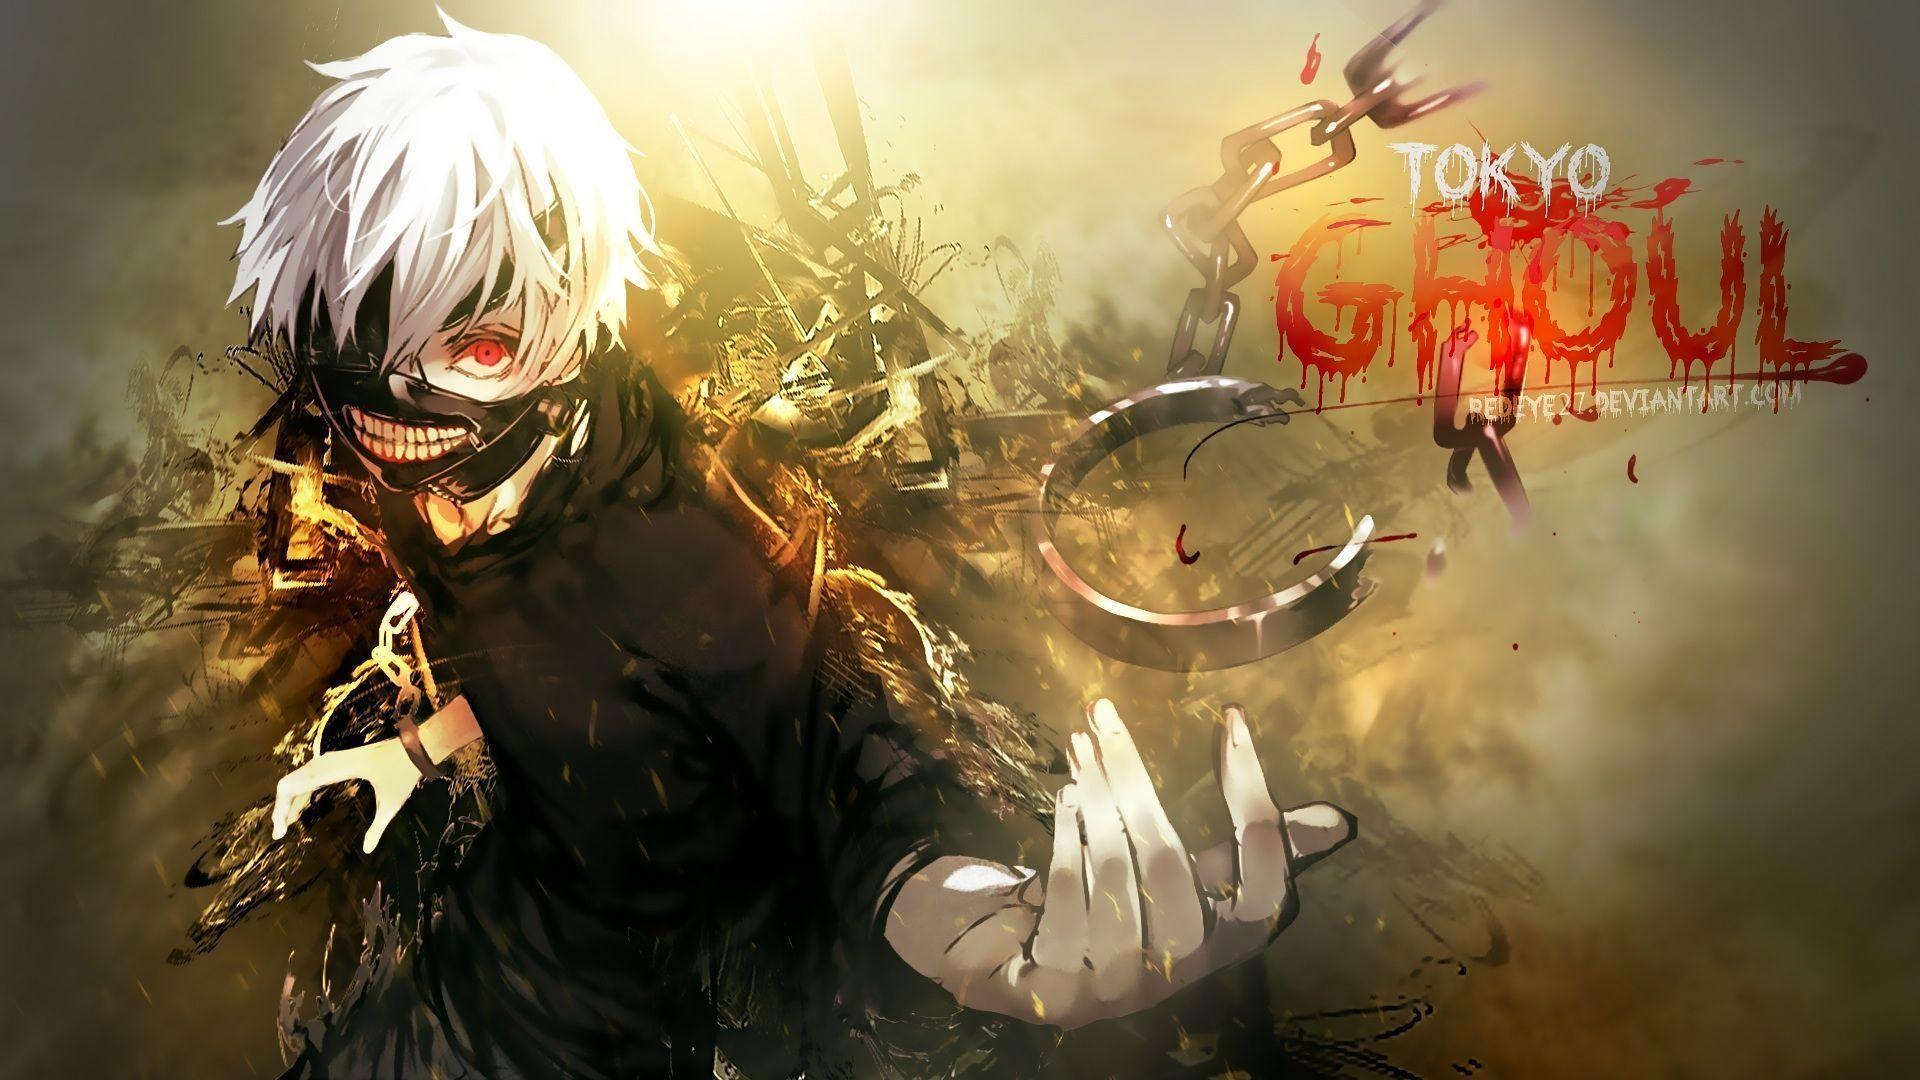 Tokyo Ghoul Images Kaneki Ken Wallpaper HD Wallpaper And ..